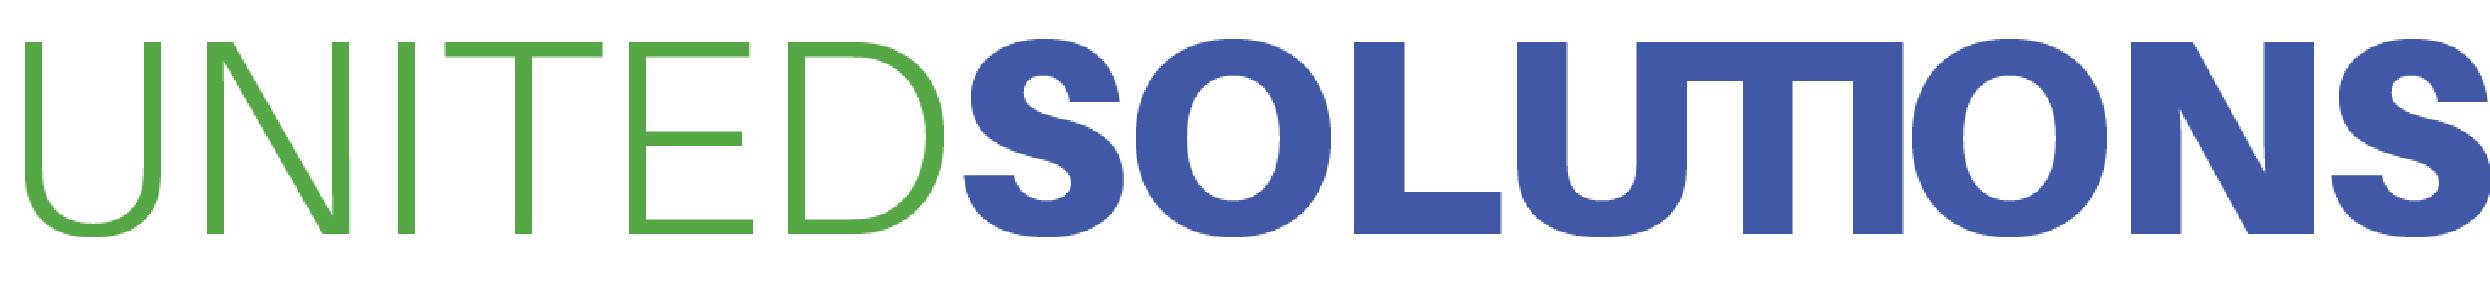 United Solutions Logo